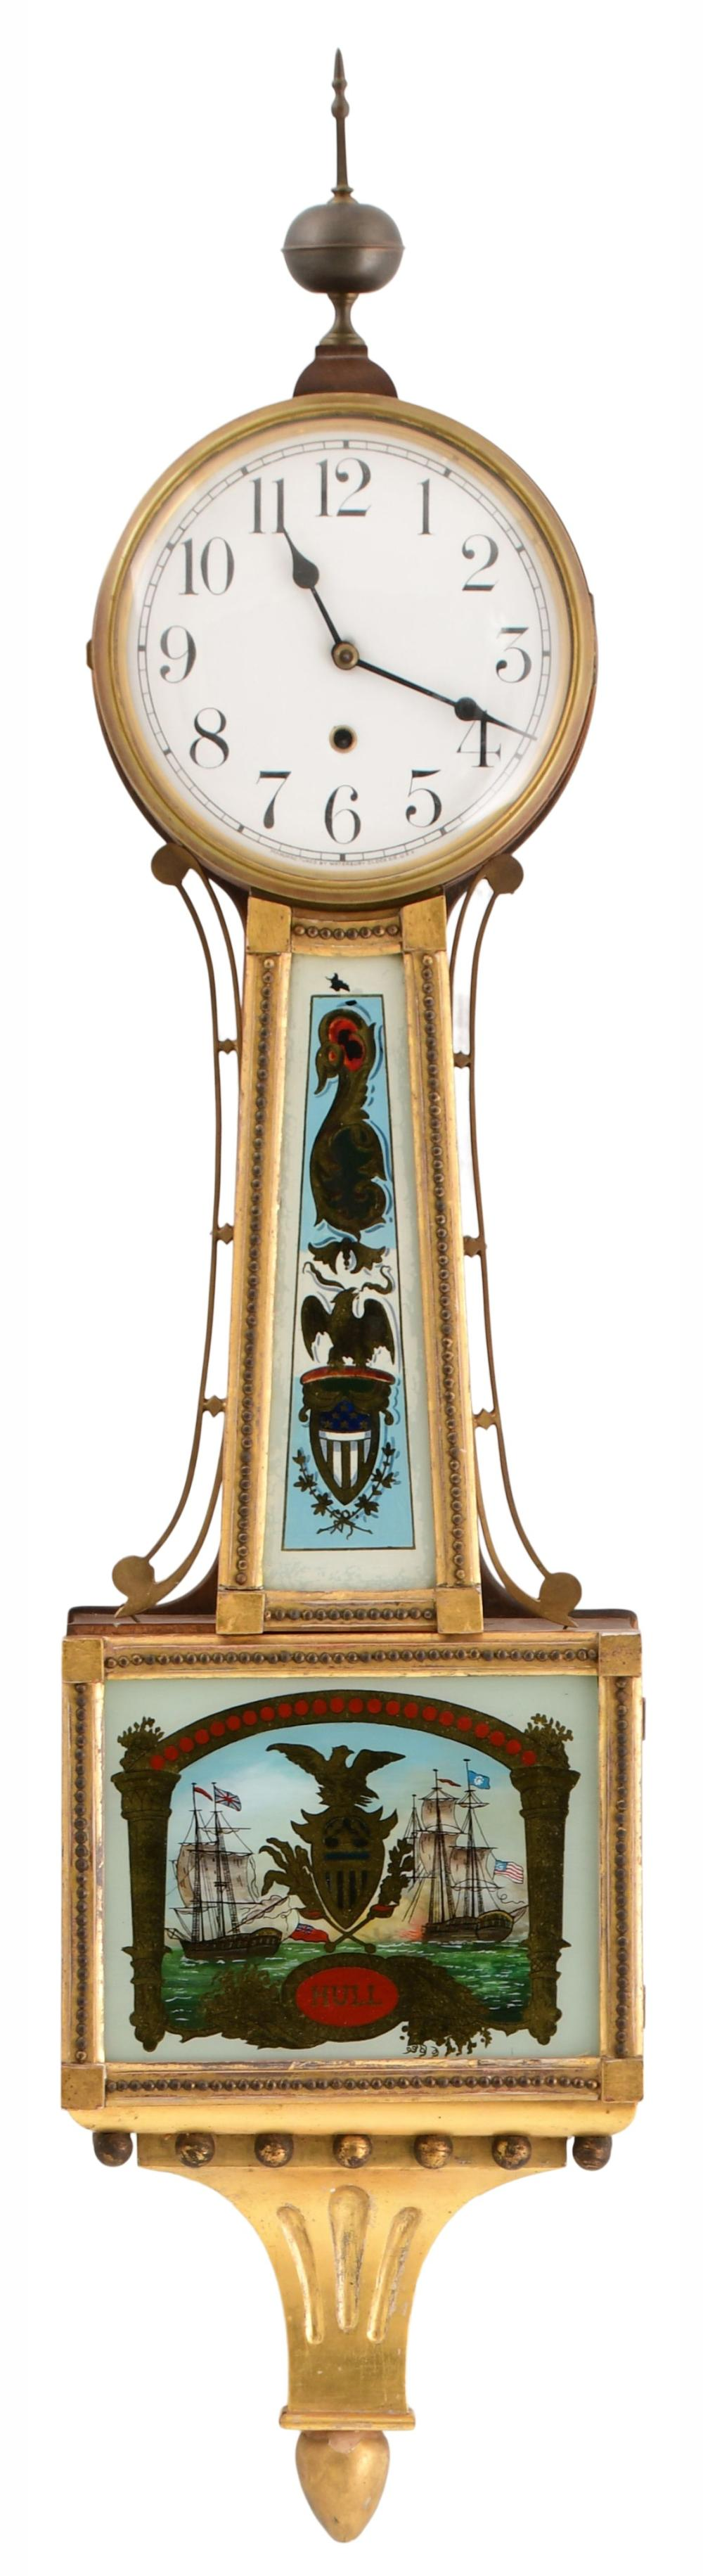 "Waterbury Clock Co. ""Willard No. 3"" Banjo Clock"